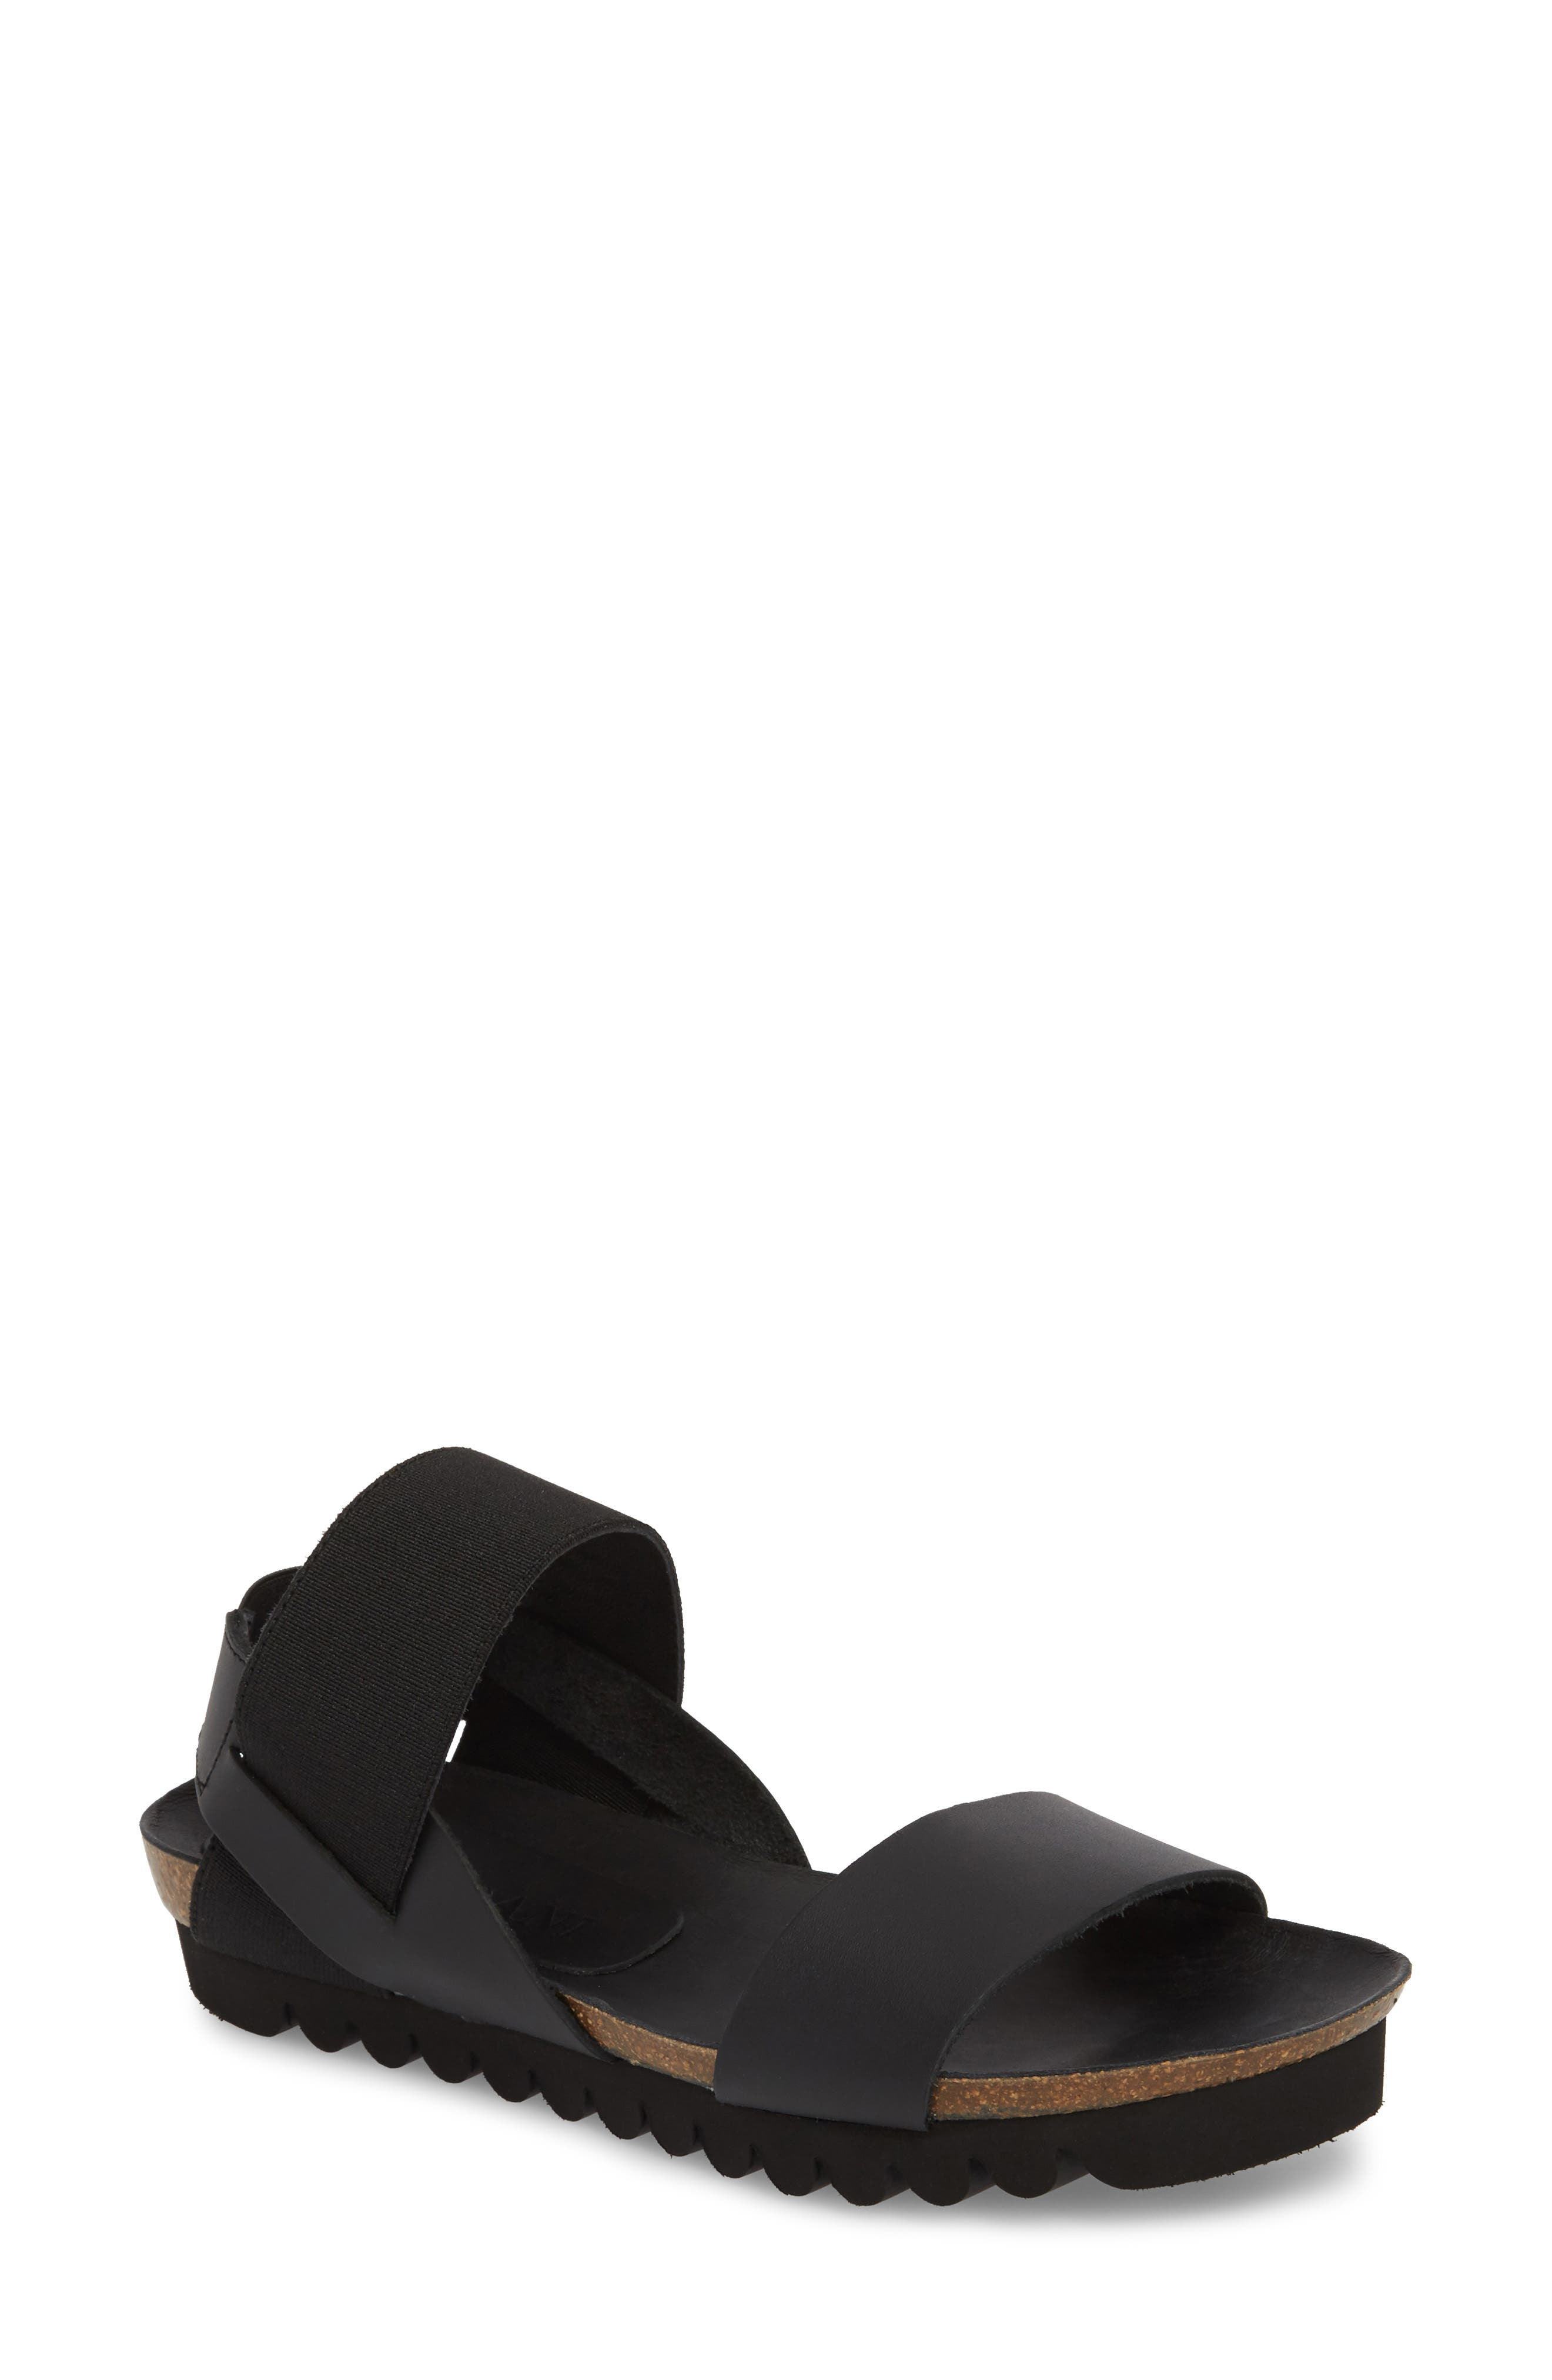 Luna Sandal,                         Main,                         color, Black Leather